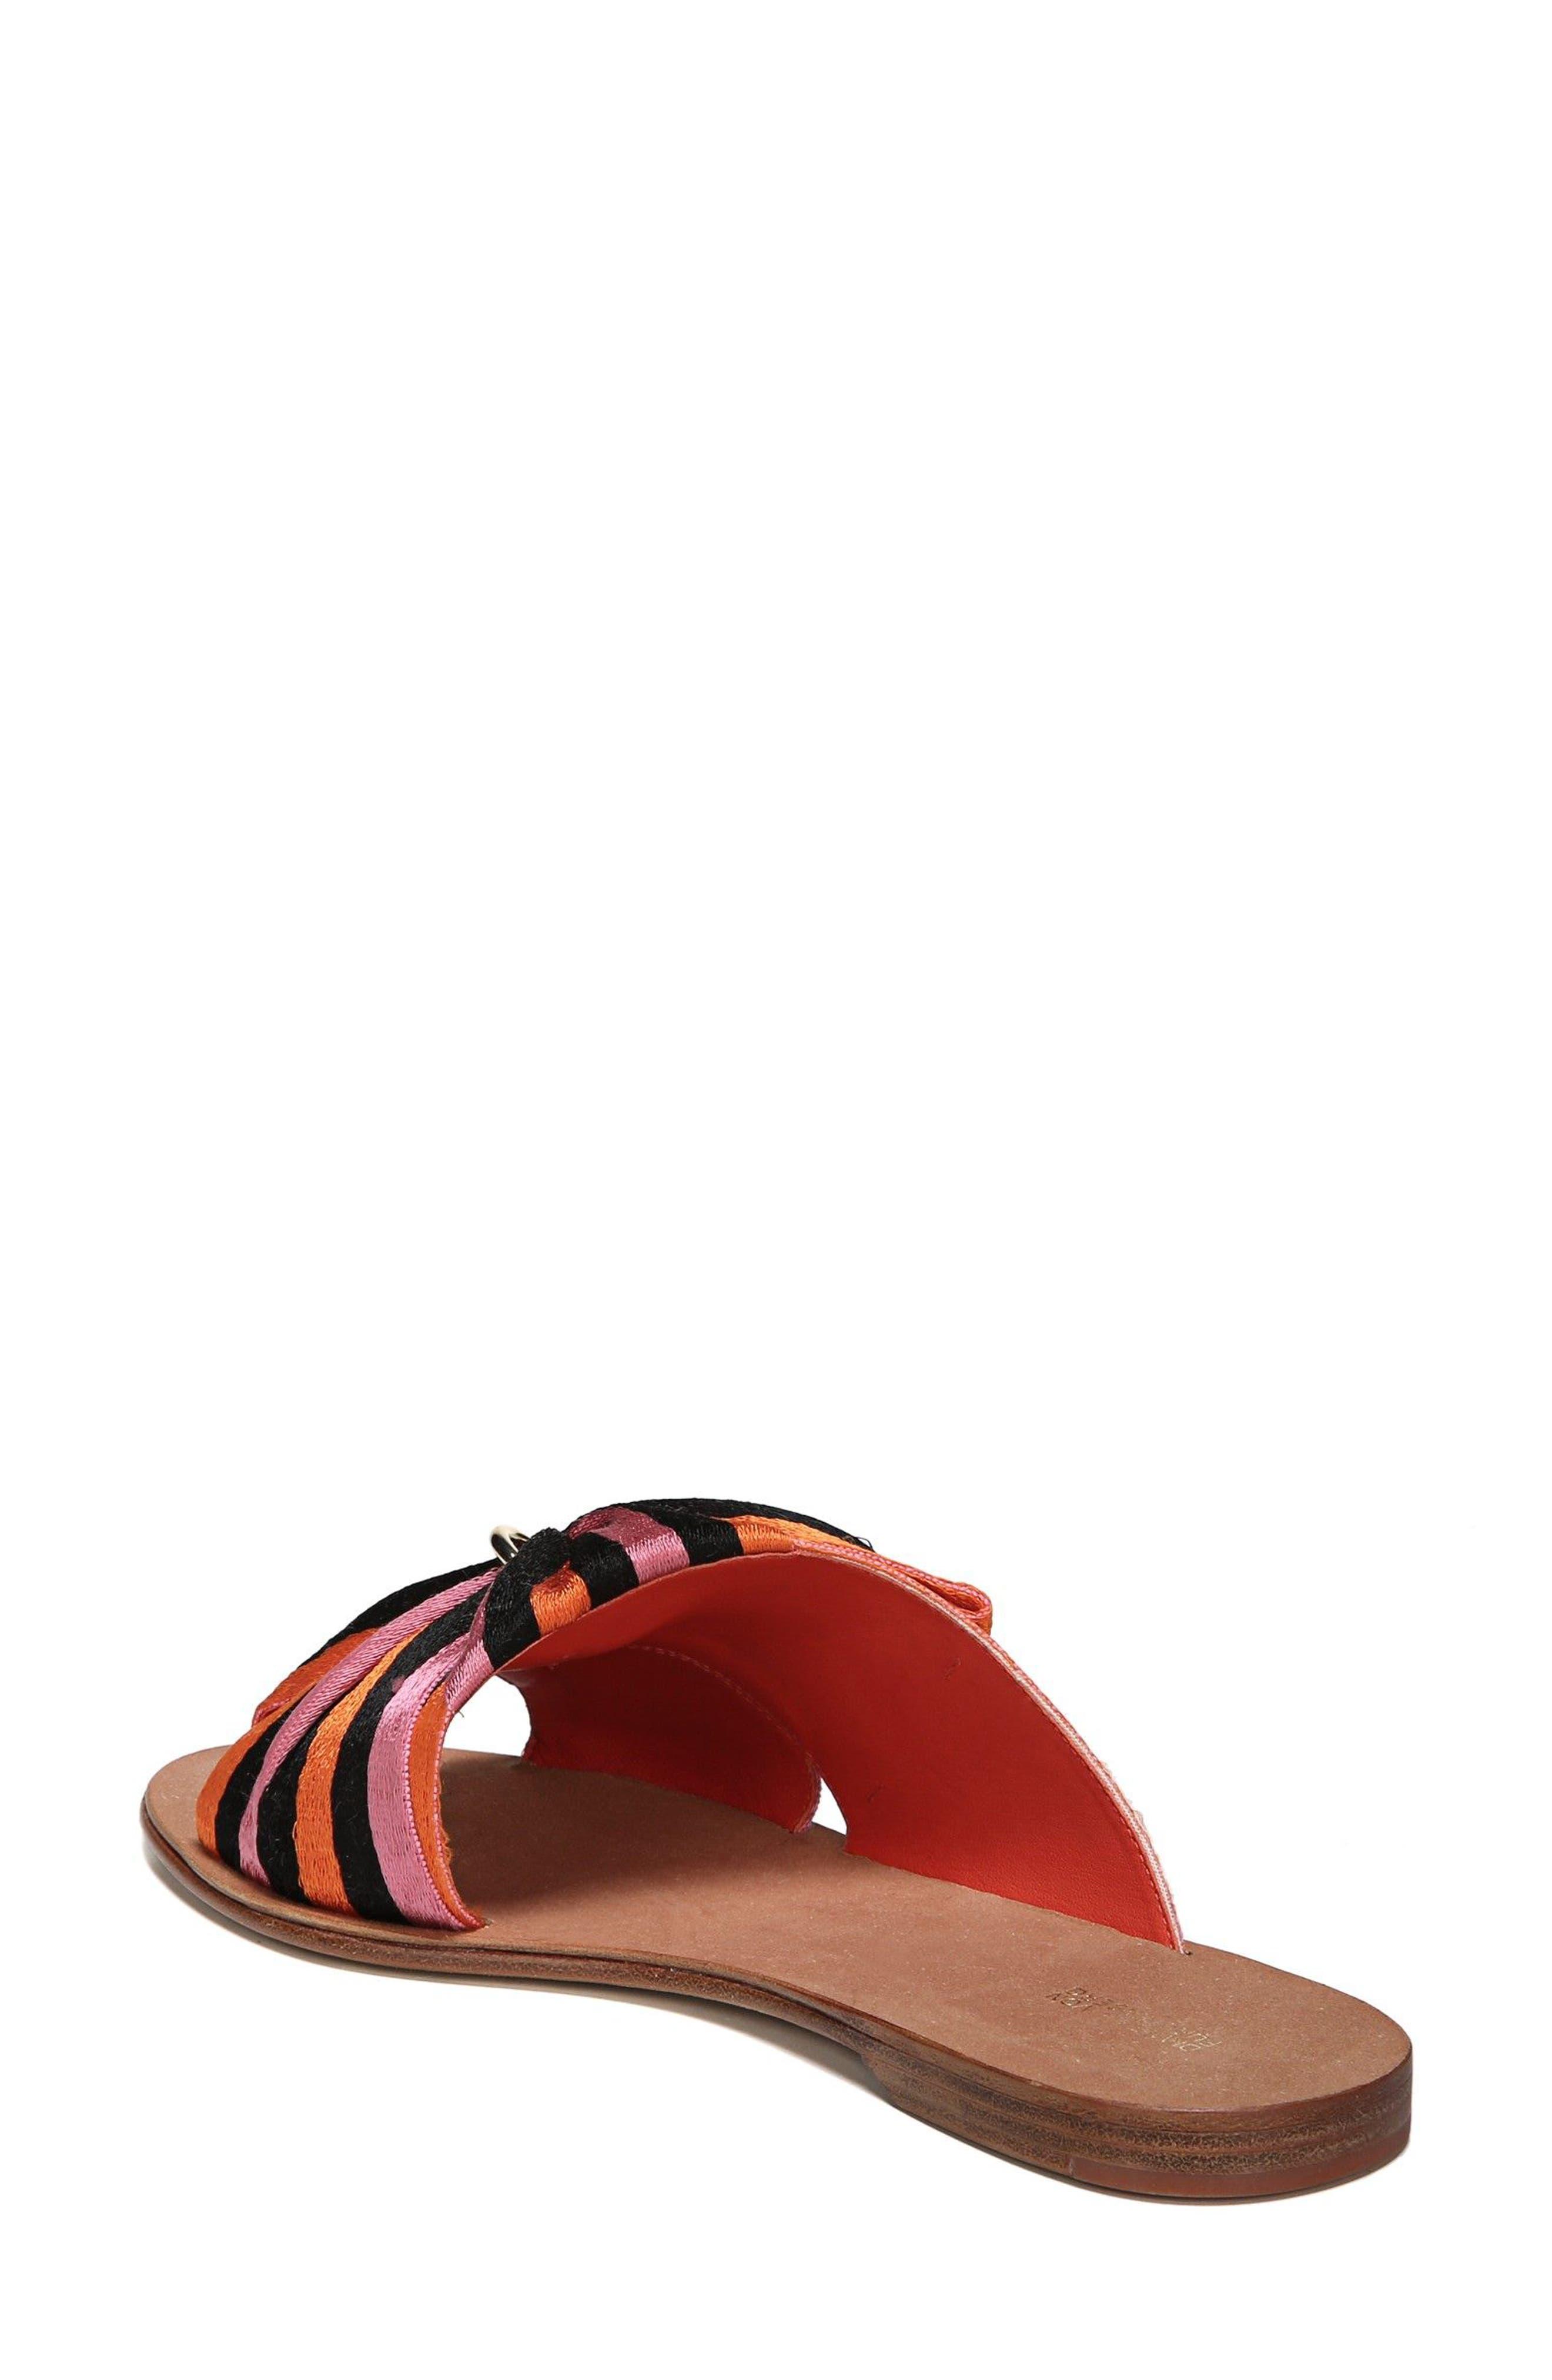 Bella Asymmetrical Slide Sandal,                             Alternate thumbnail 4, color,